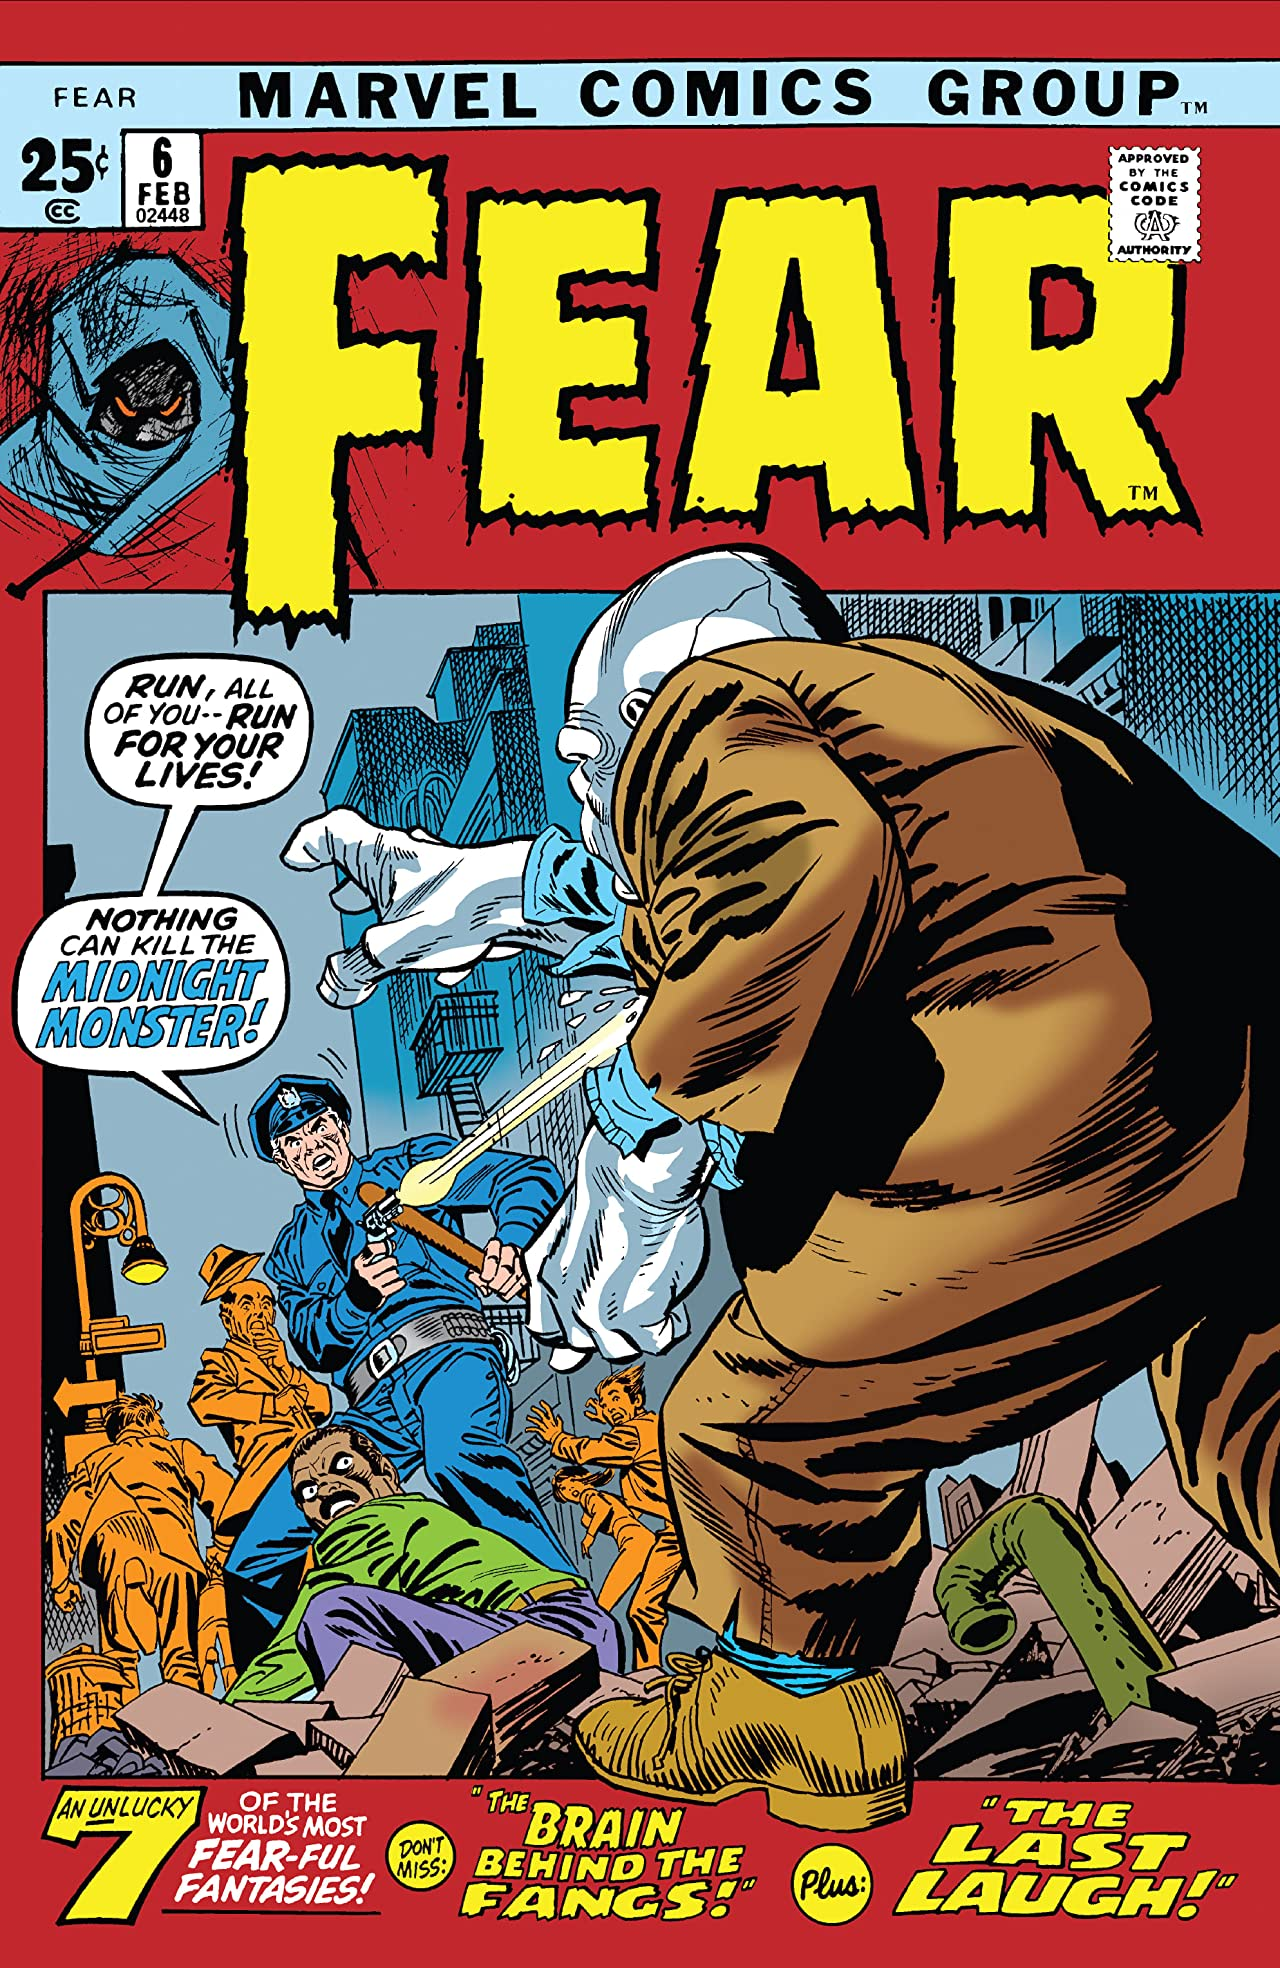 Adventure Into Fear (1970-1975) #6